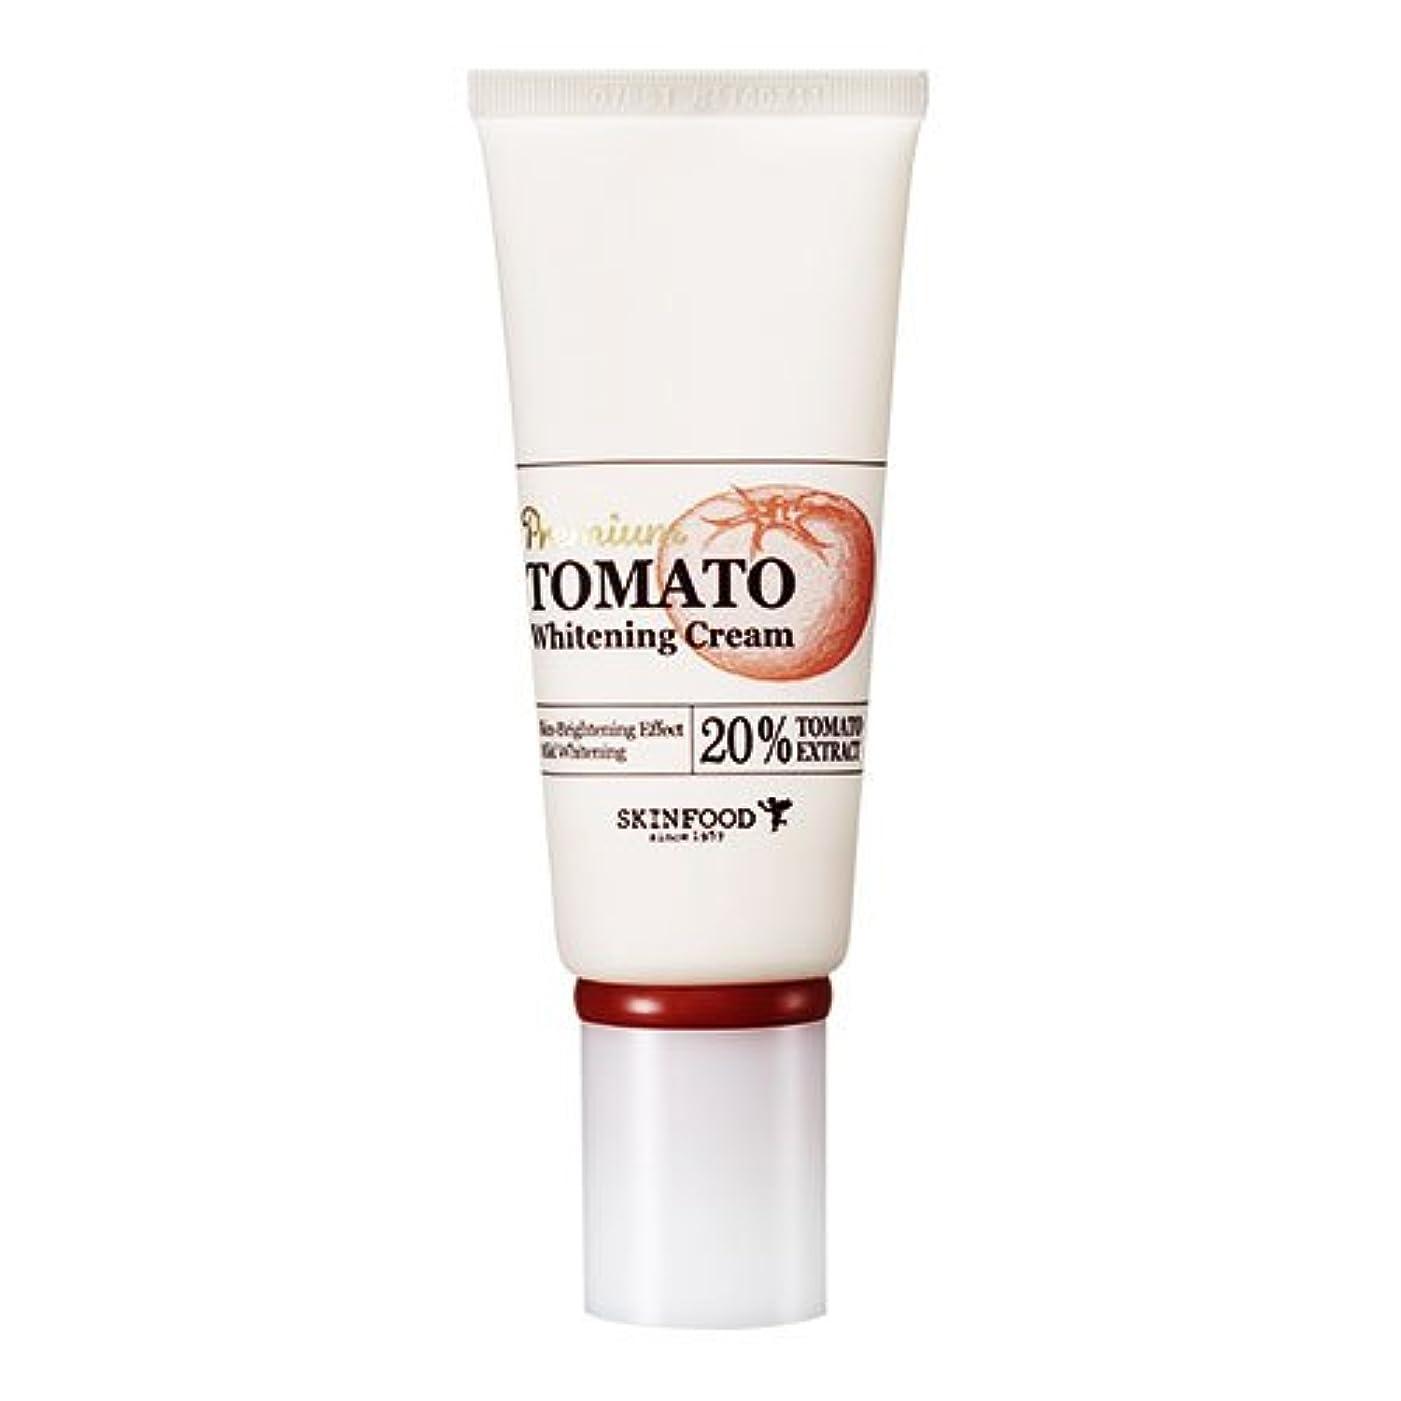 Skinfood プレミアムトマトホワイトニングクリーム(美白効果) / Premium Tomato Whitening Cream (Skin-Brightening Effect) 50g [並行輸入品]